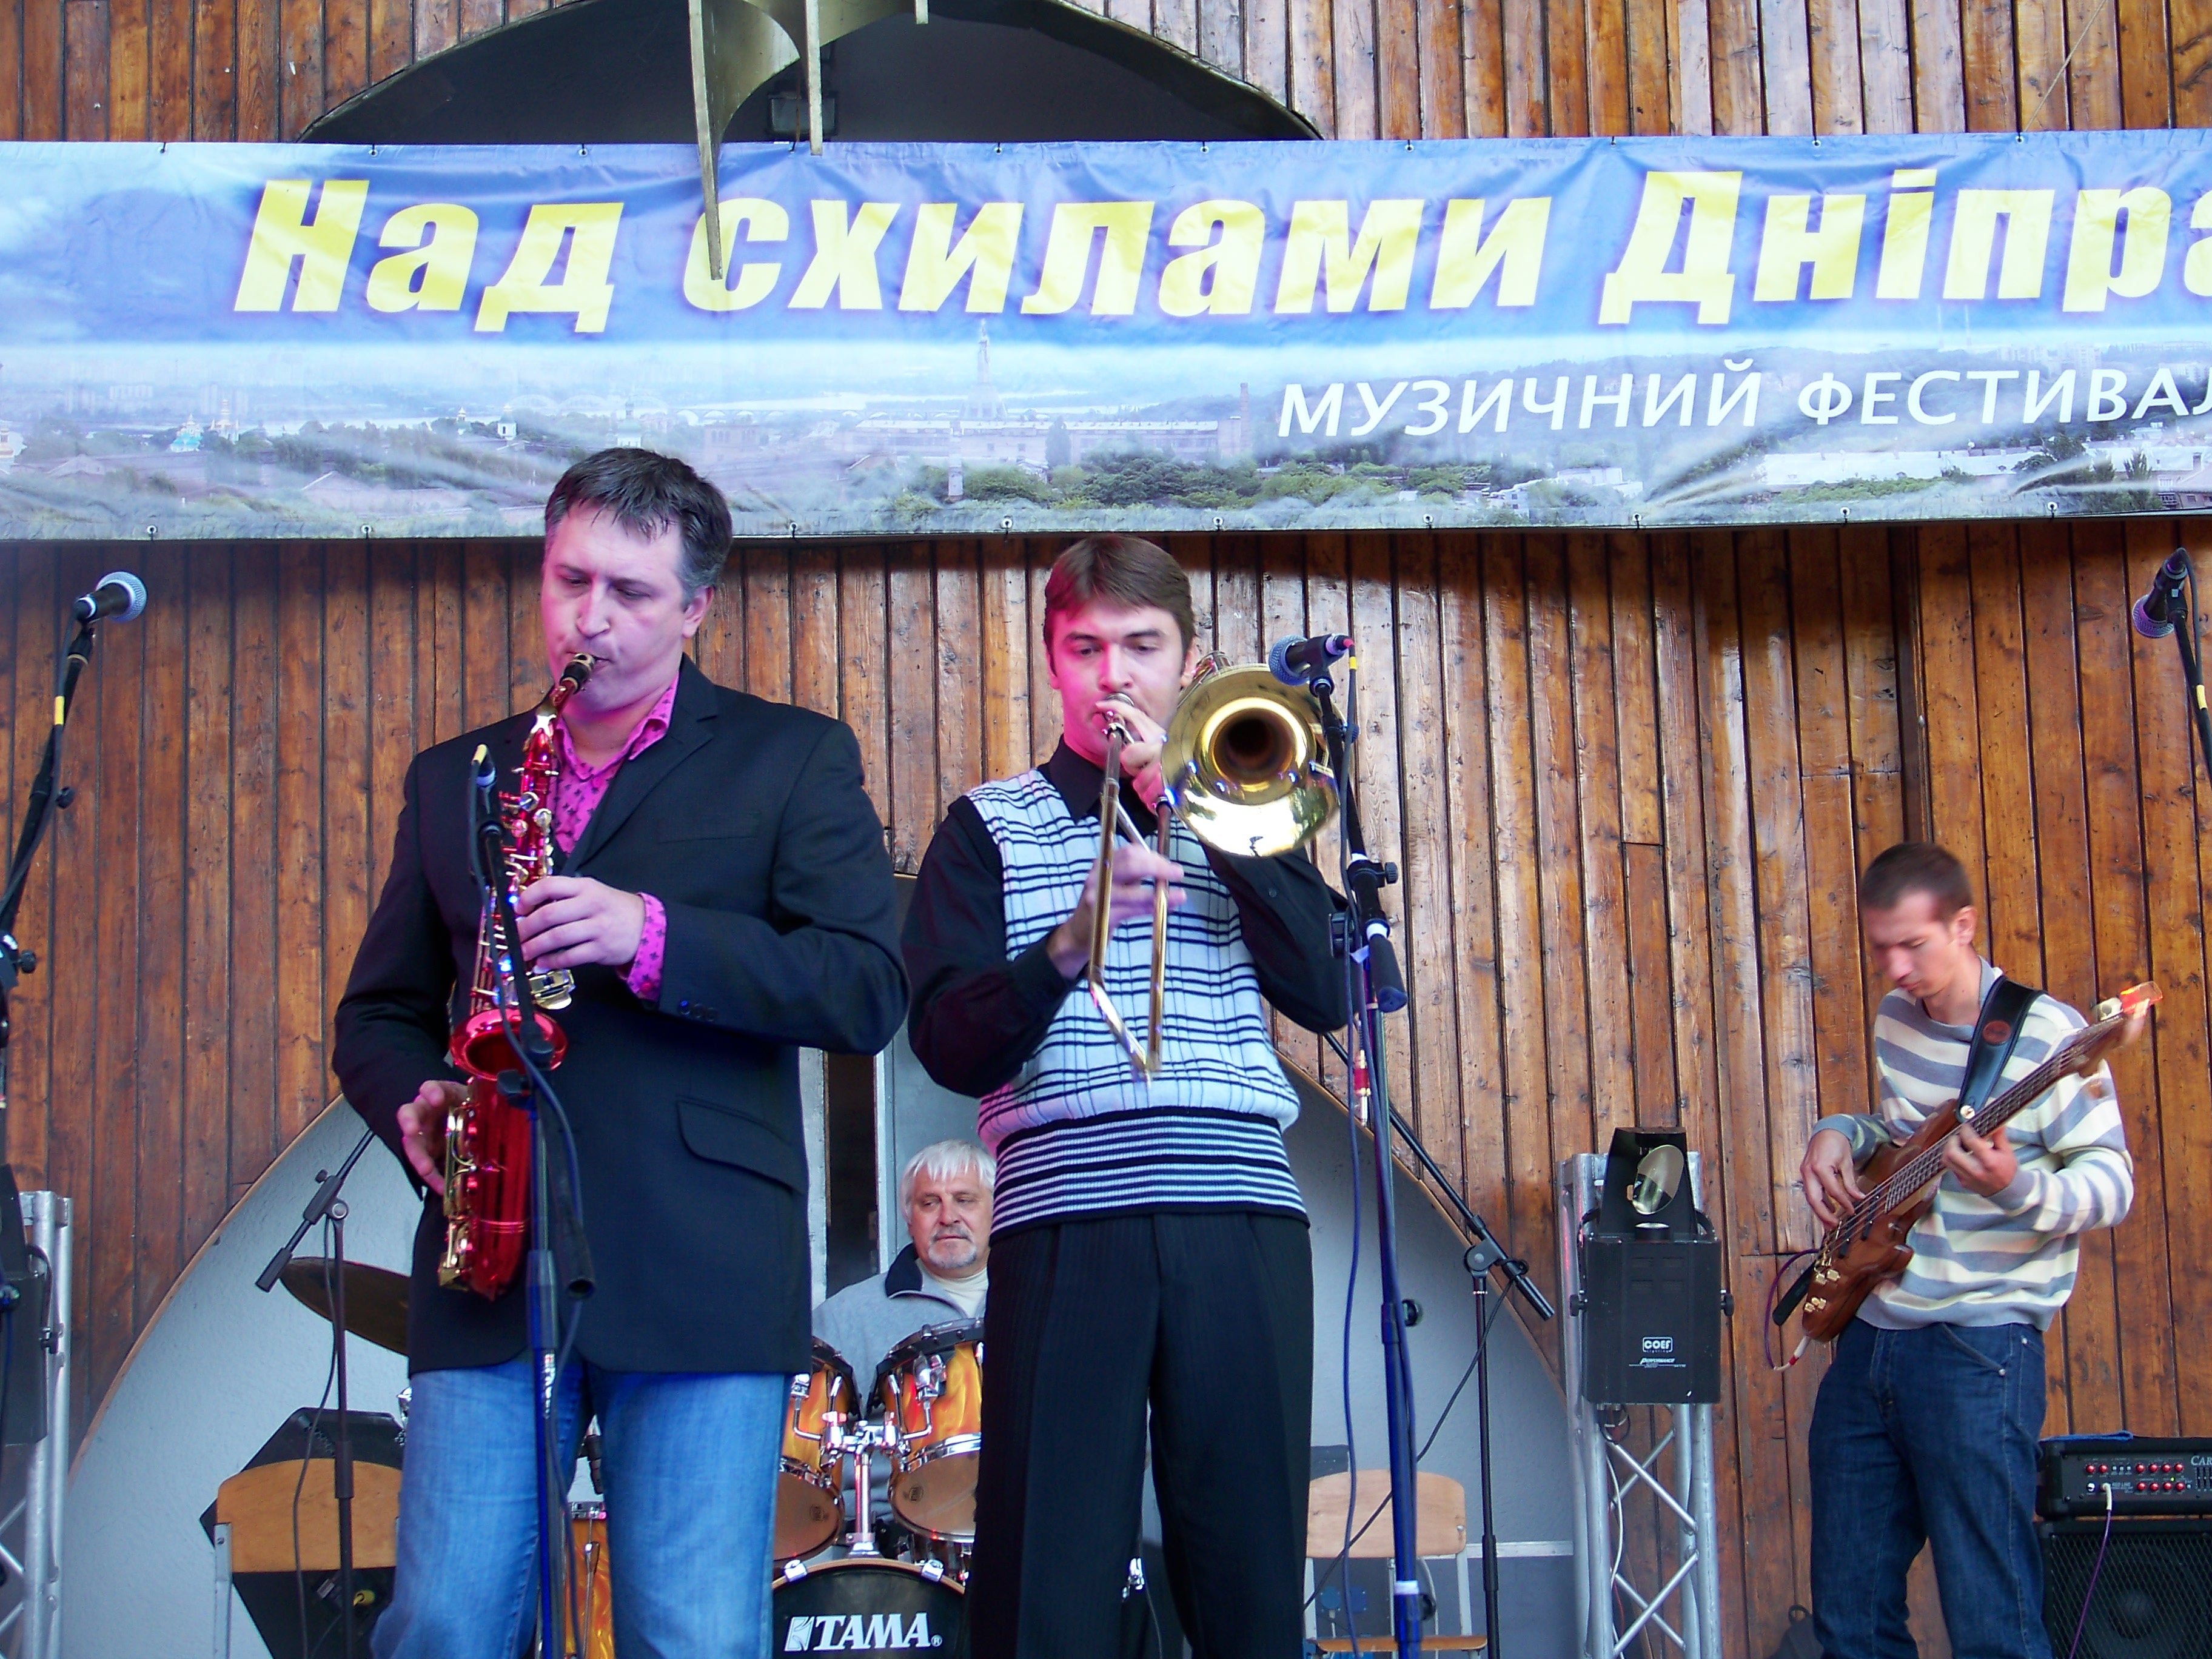 "Християнський фестиваль ""Над схилами Дніпра"""